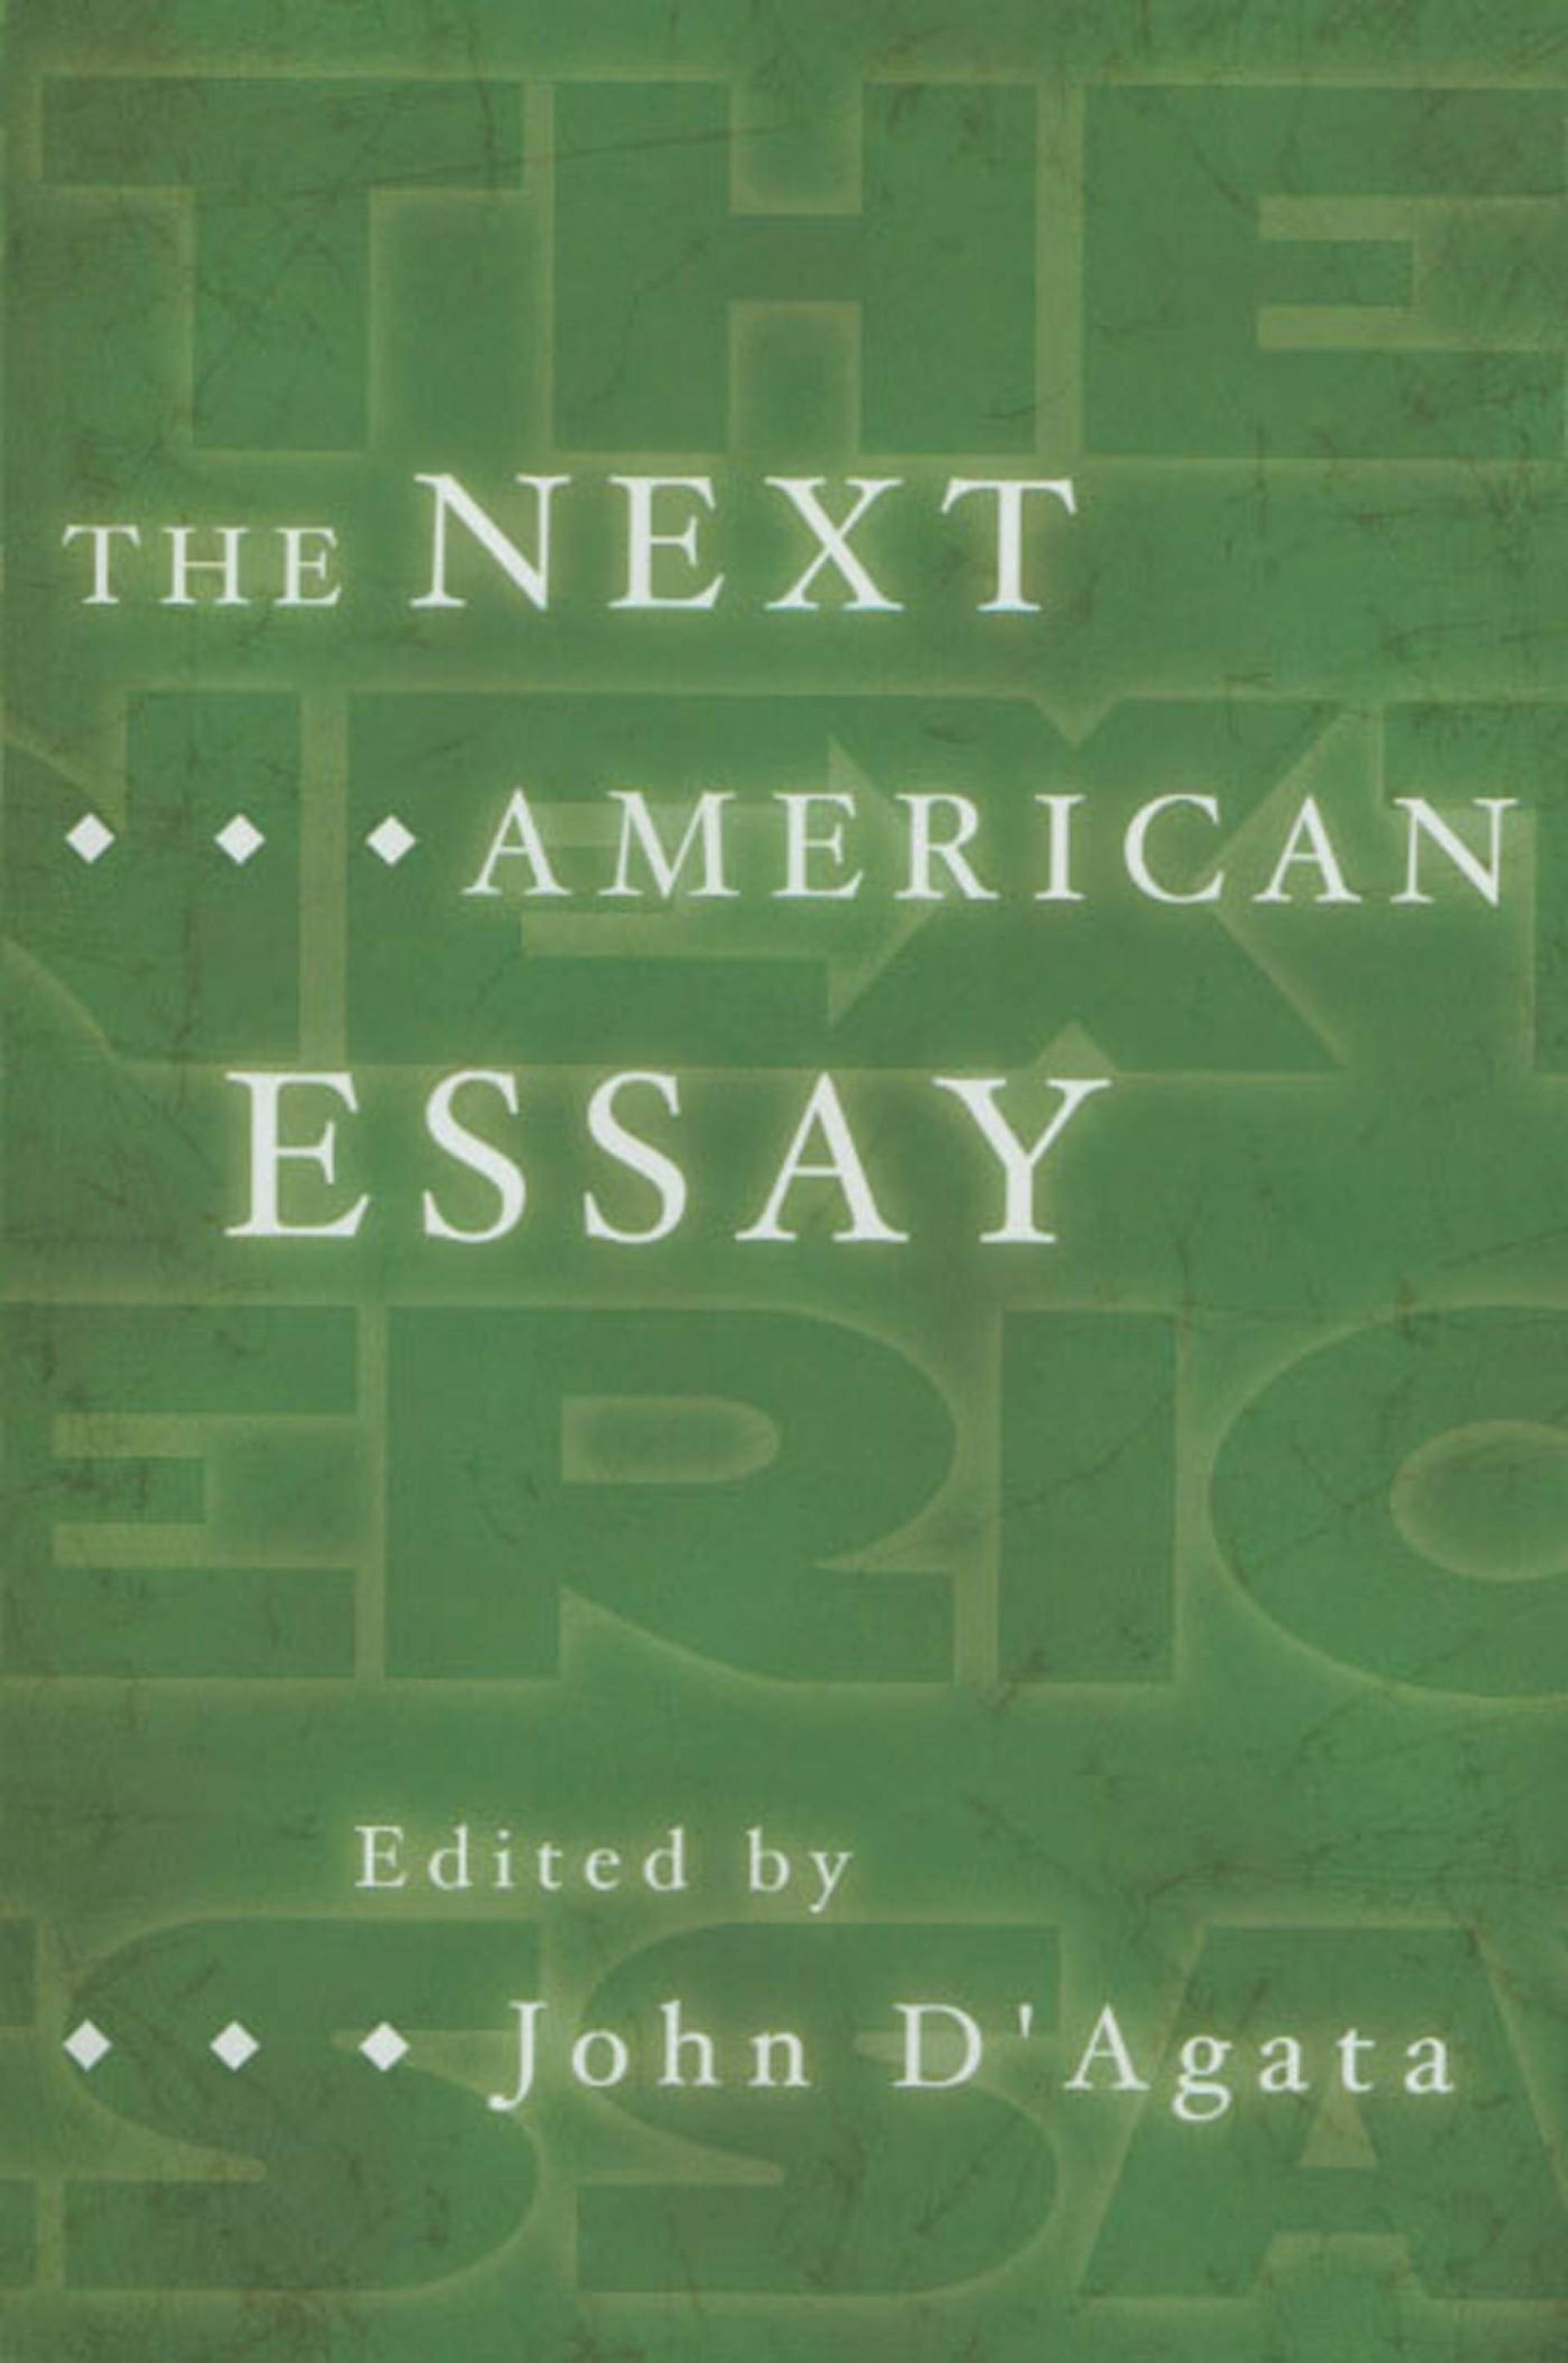 024 61uwmdqvqdl American Essay Striking Best Writers Creed Contest Identity Titles 1920